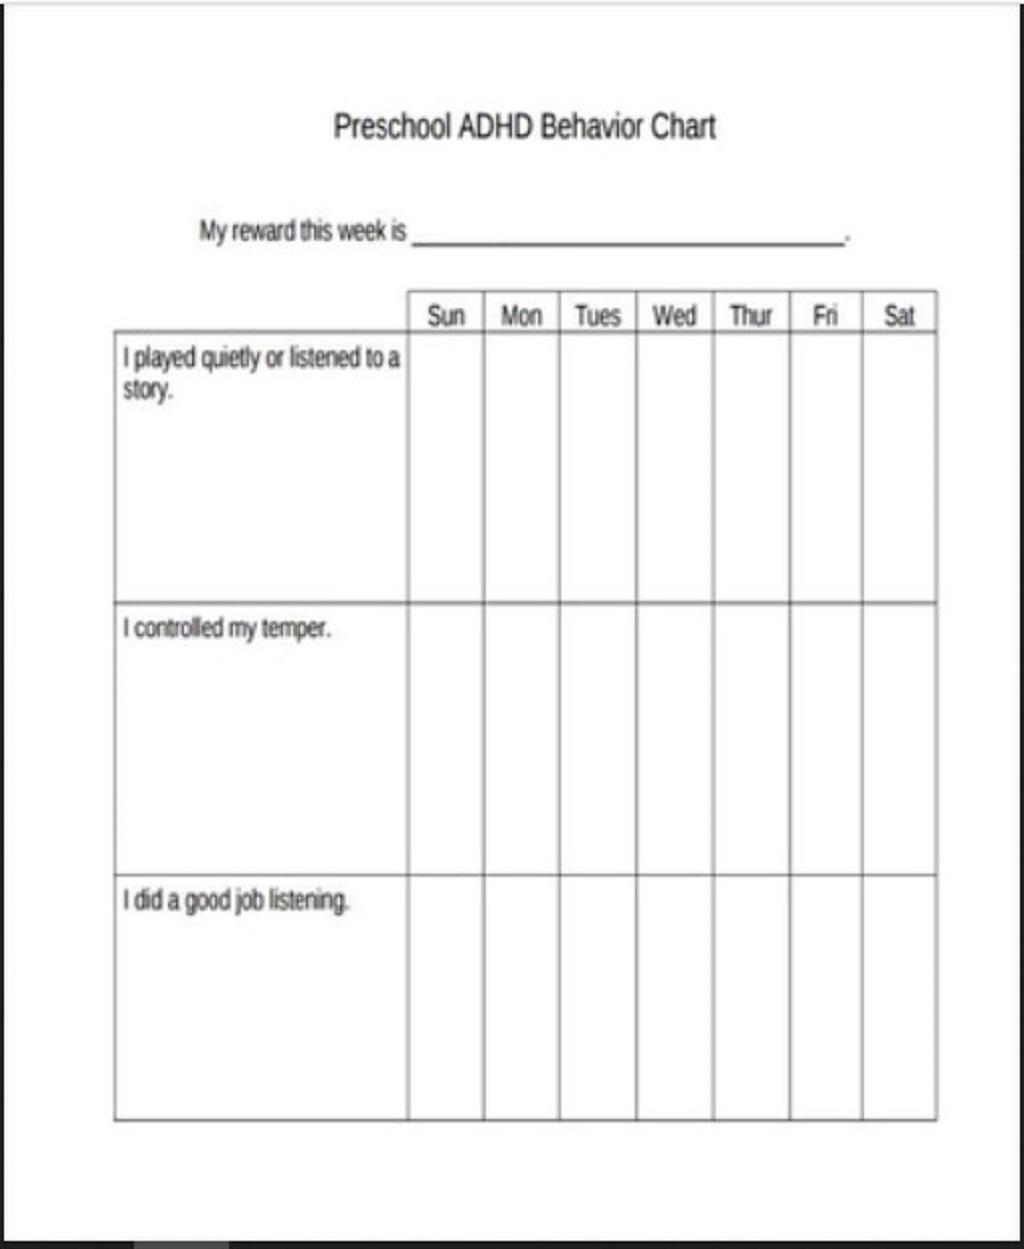 Preschool ADHD Behavior Chart Template Sample Printable Charts For Home Pdf Teachers Classroom  Samples Large